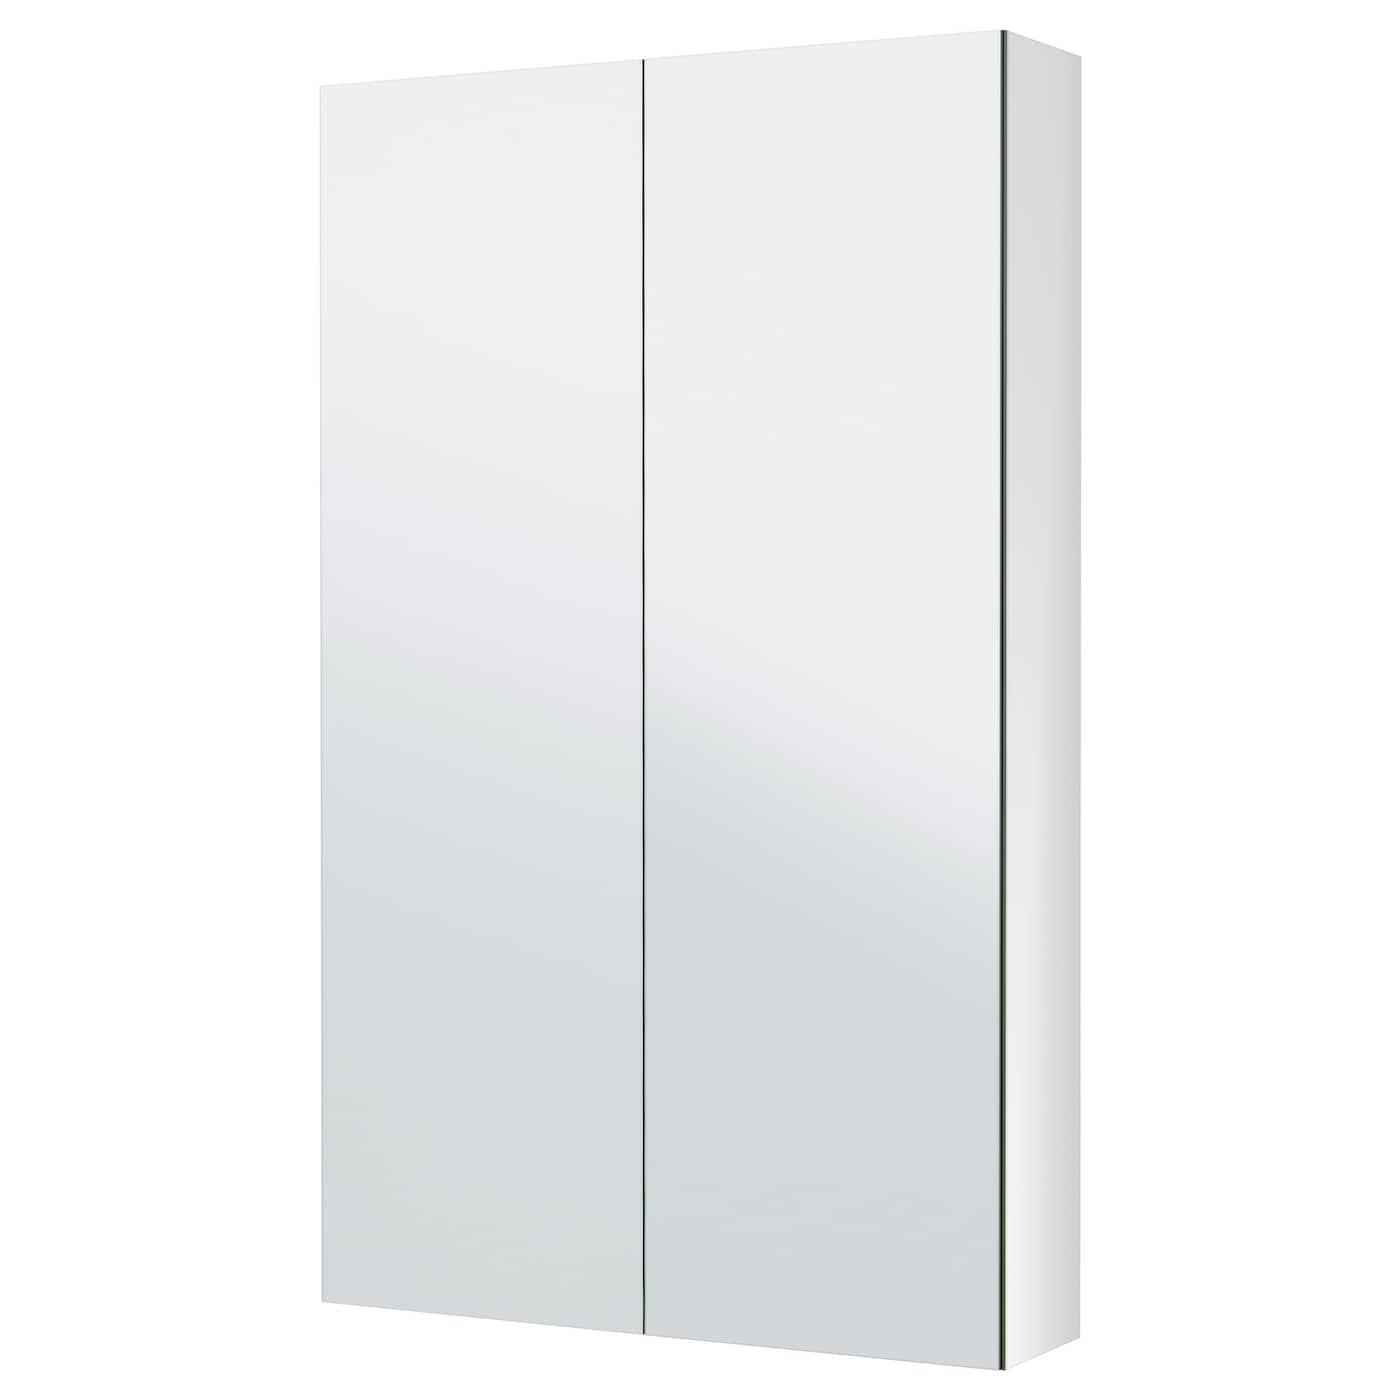 Godmorgon mirror cabinet with 2 doors 60x14x96 cm ikea - Ikea wall cabinets ...